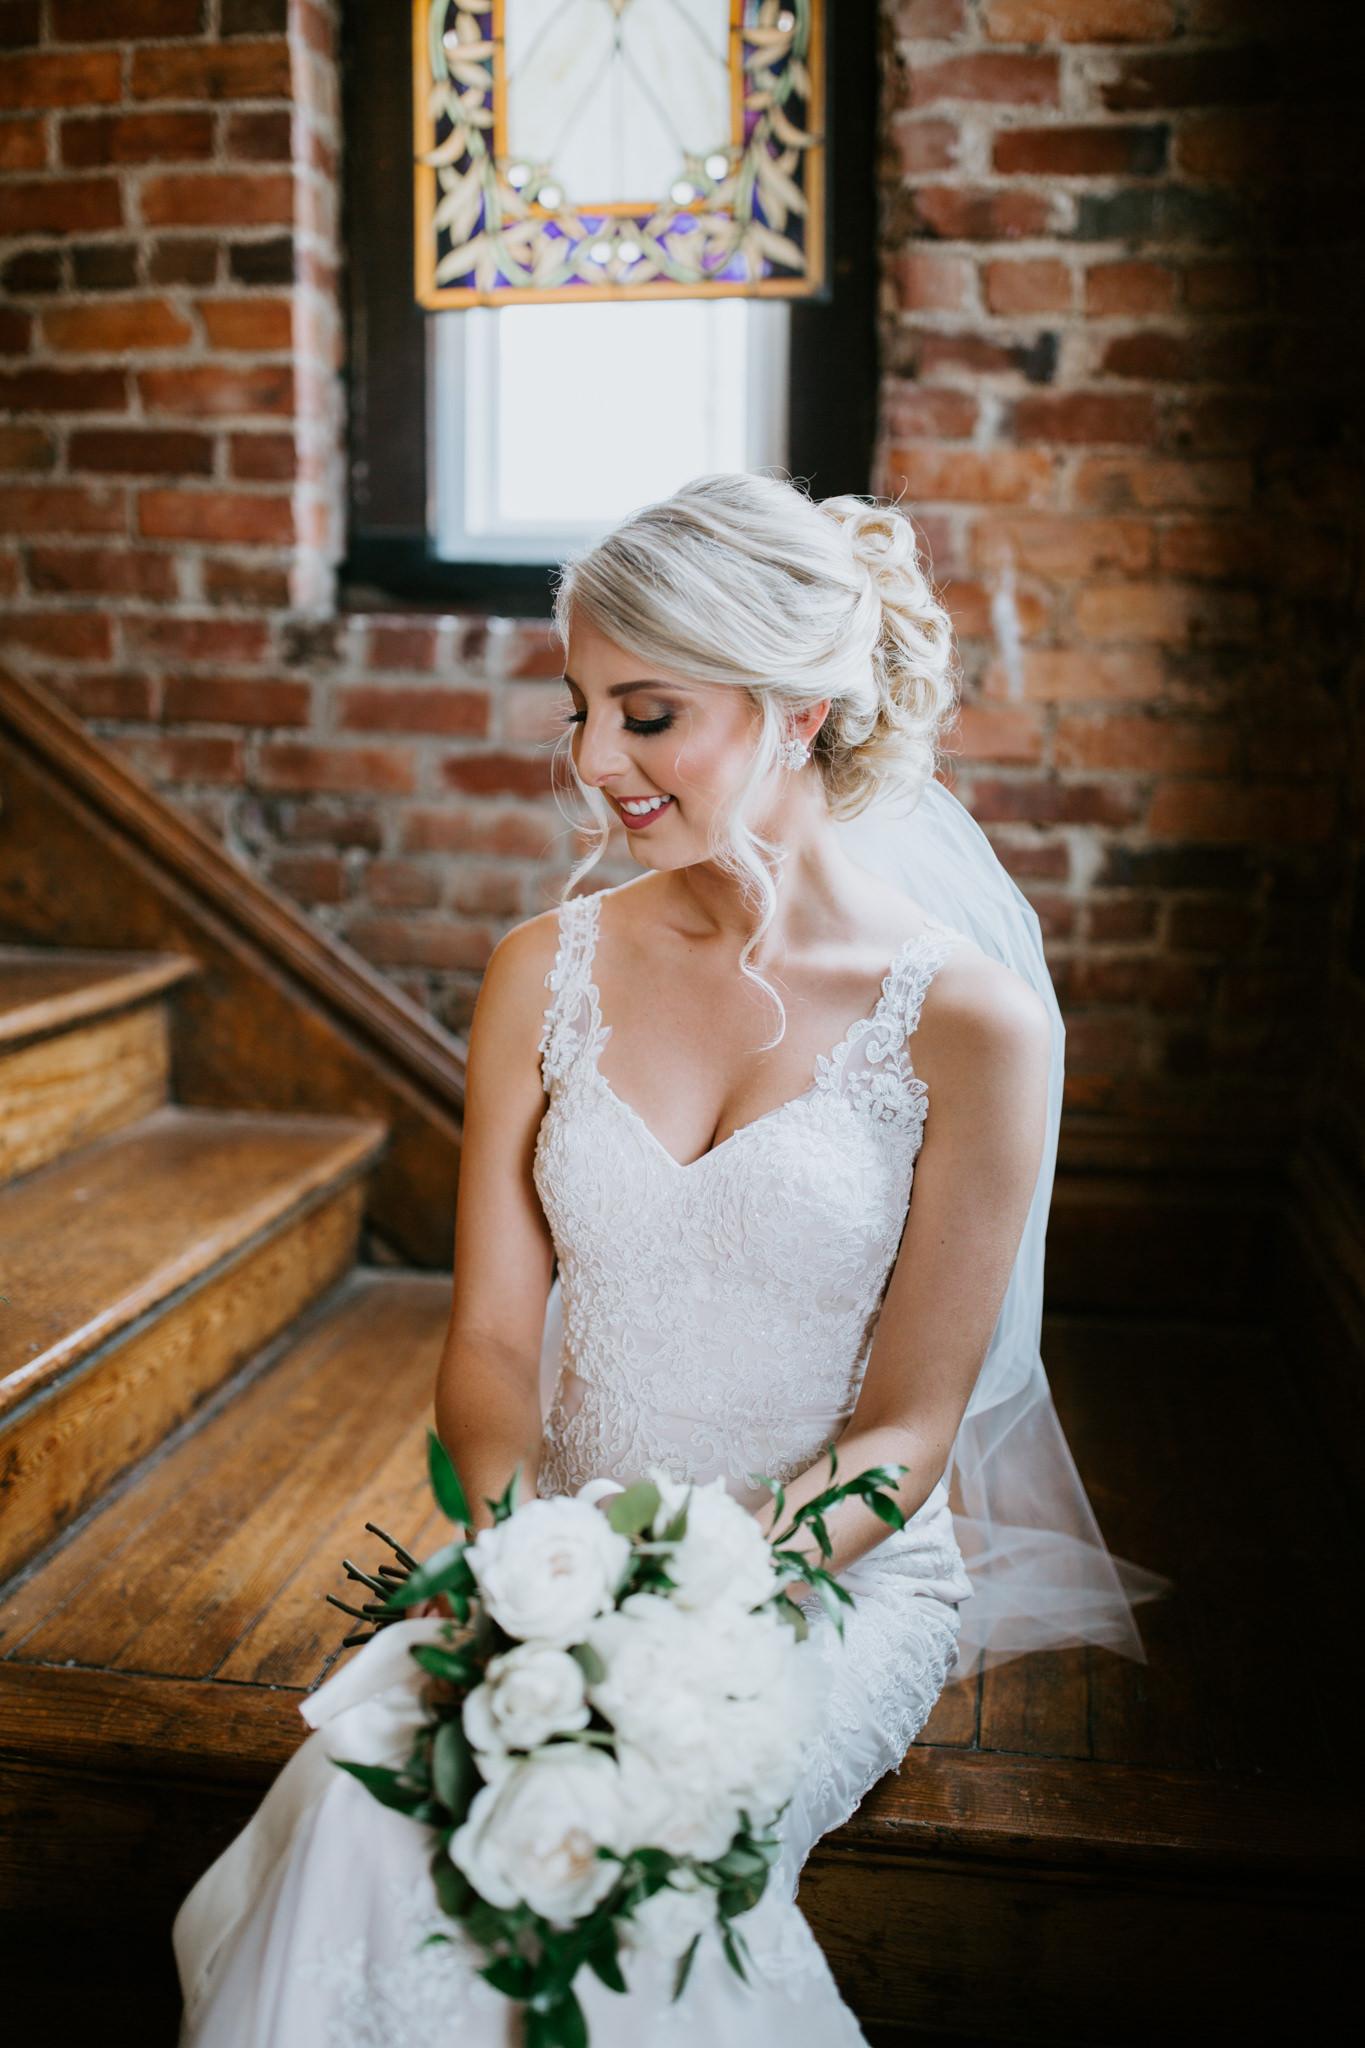 Kayley + Robert + Chattanooga + Nashville + Tennessee + Wedding-5.jpg